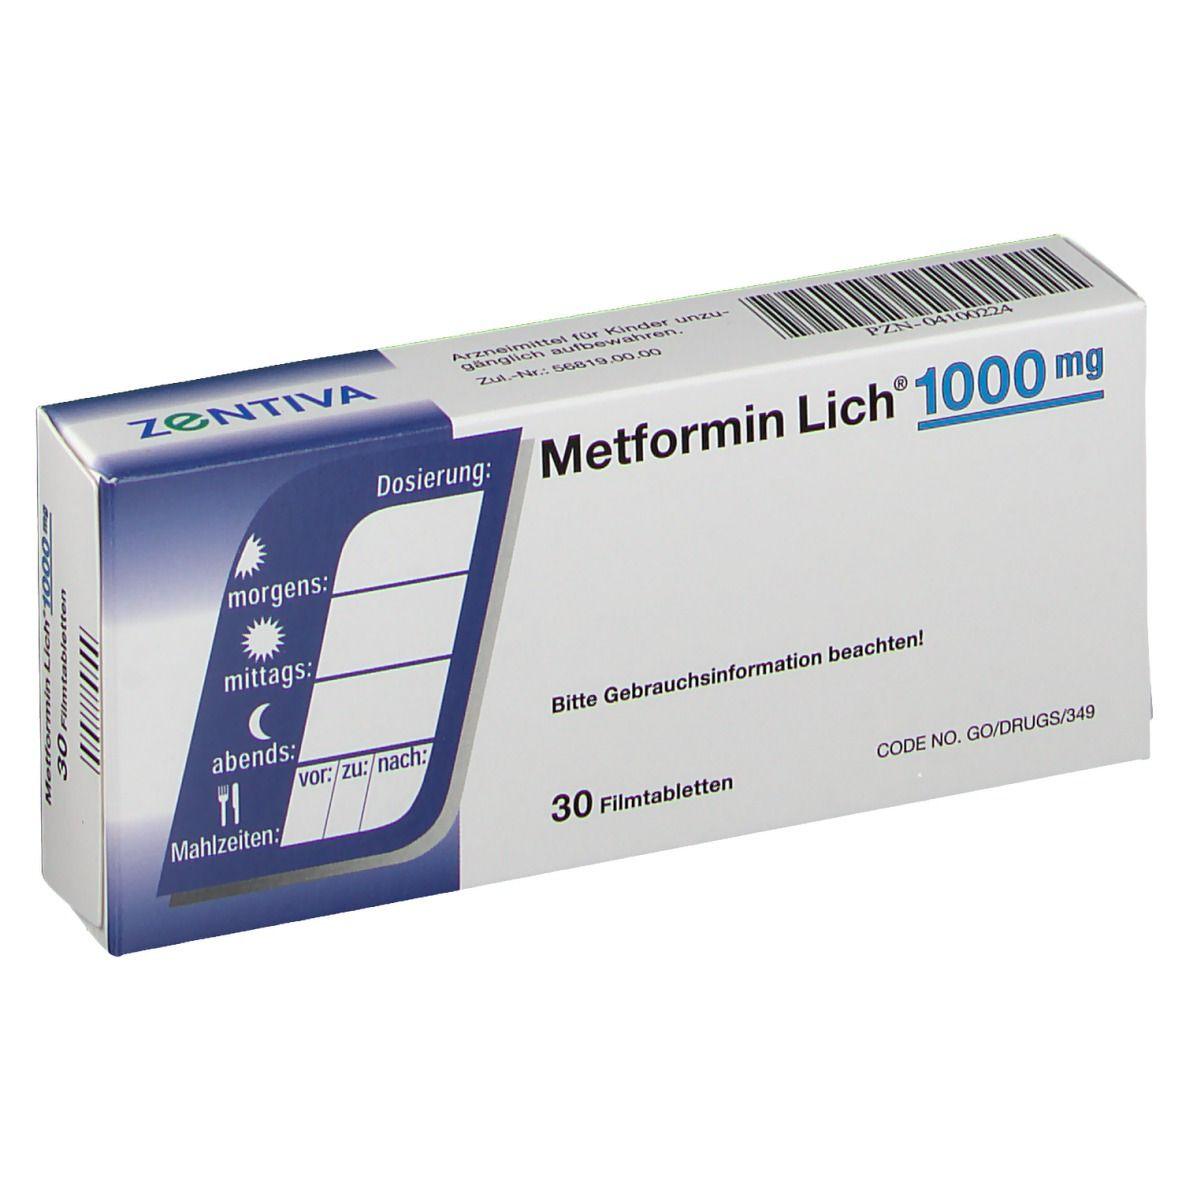 Metformin zur Gewichtsreduktion Diclofenac Dosis